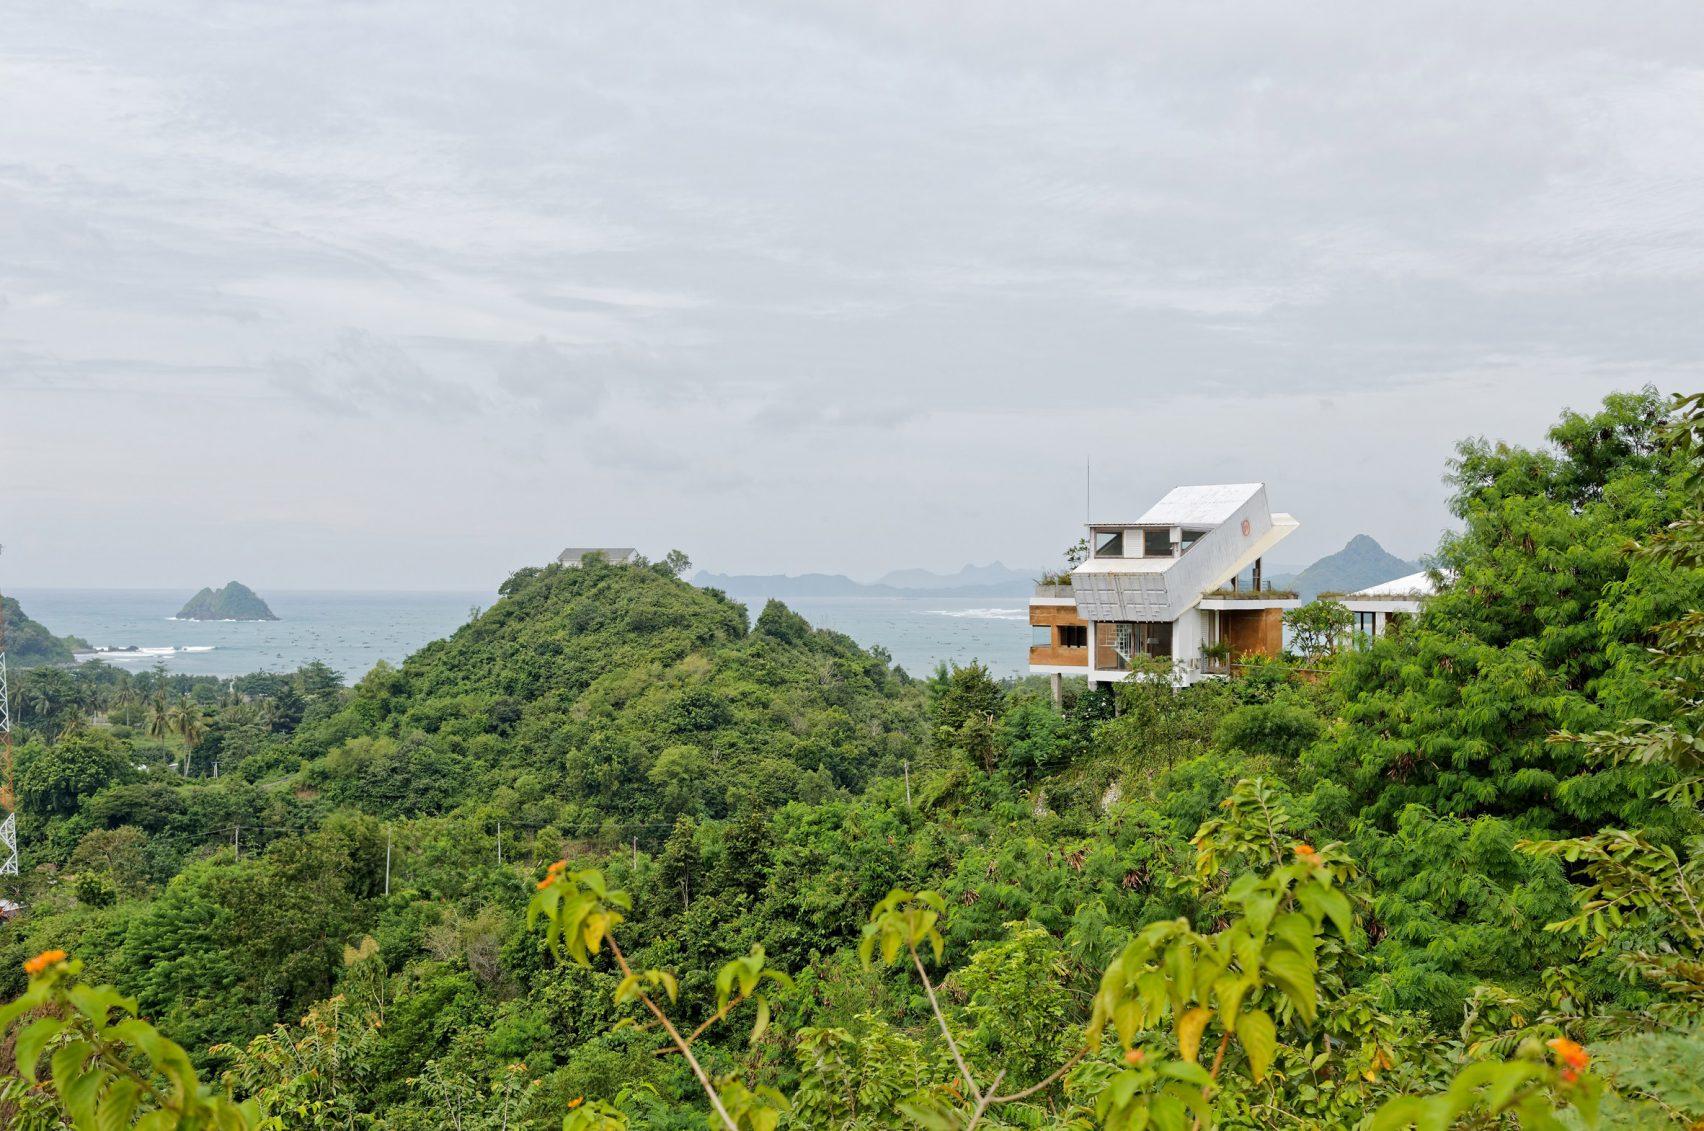 clay-house-budi-pradono-architects-architecture_dezeen_2364_col_15-1704x1131.jpg